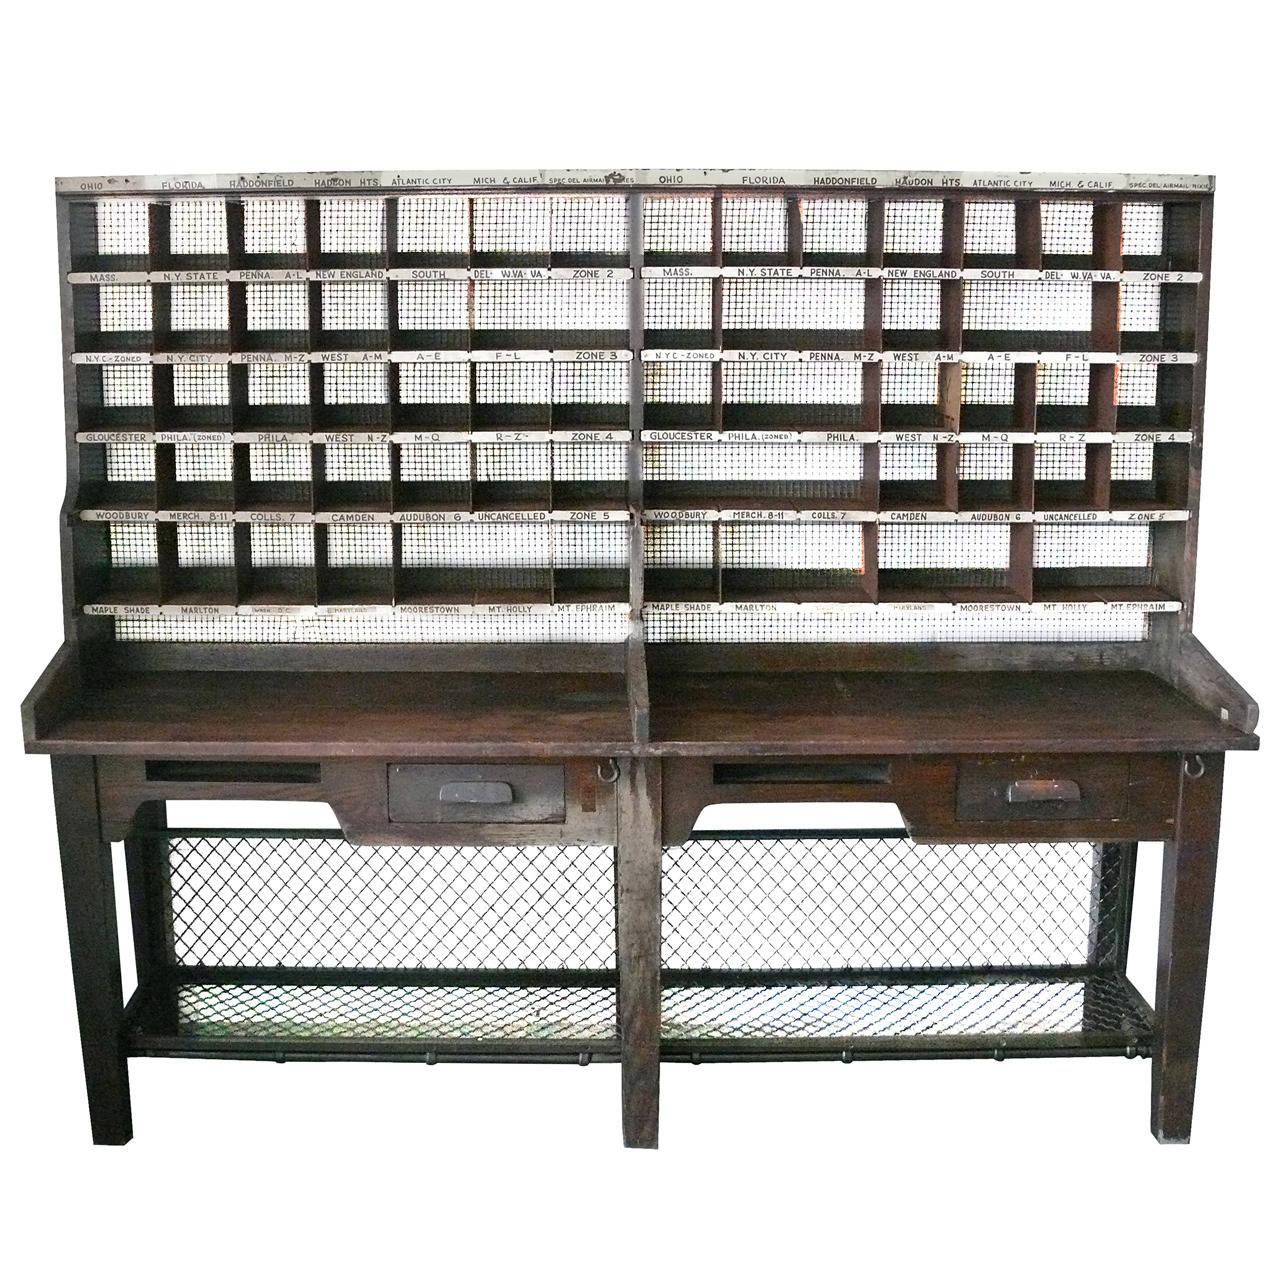 Industrial Metal Desk Cabinets